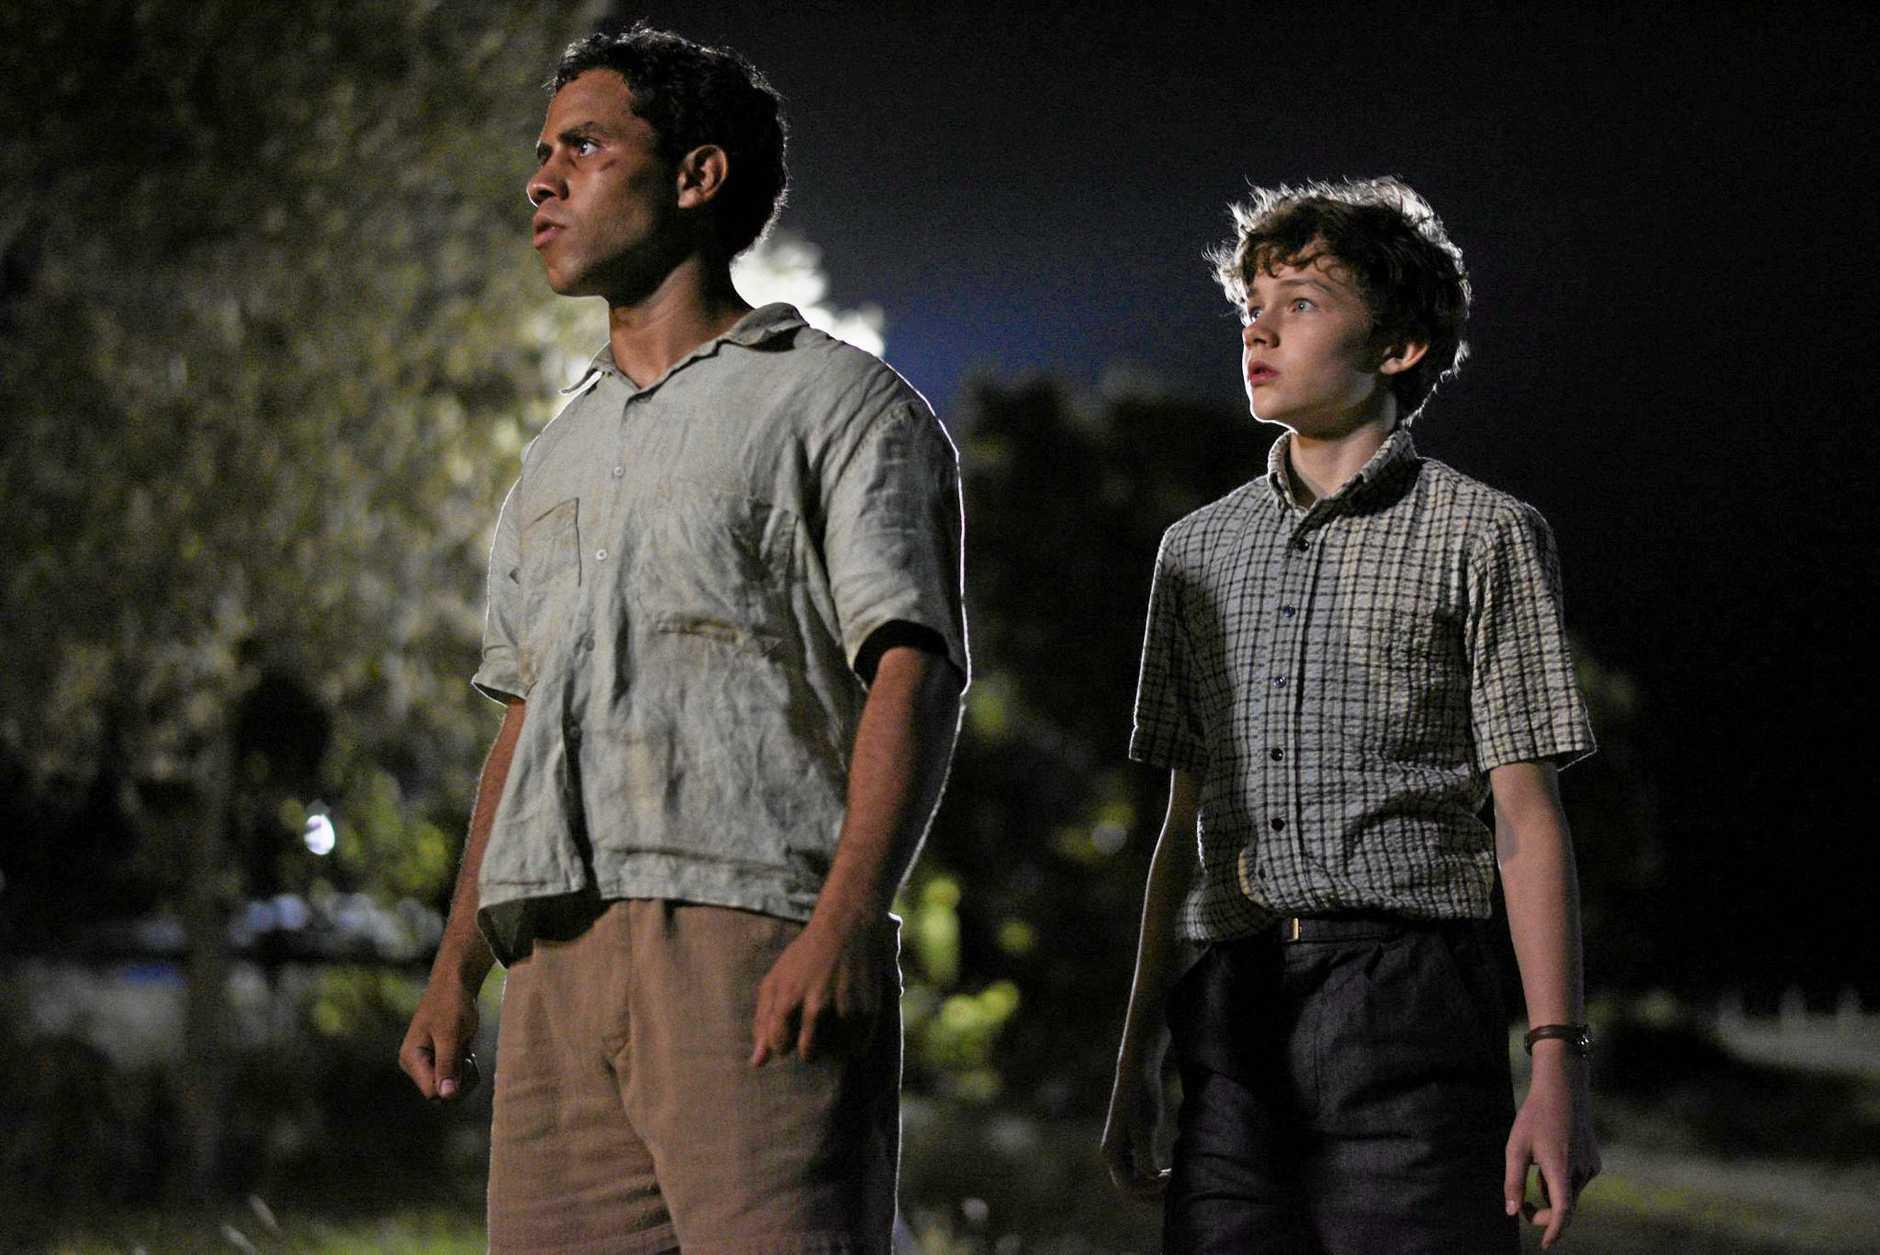 Aaron L McGrath and Levi Miller in a scene from the movie Jasper Jones.